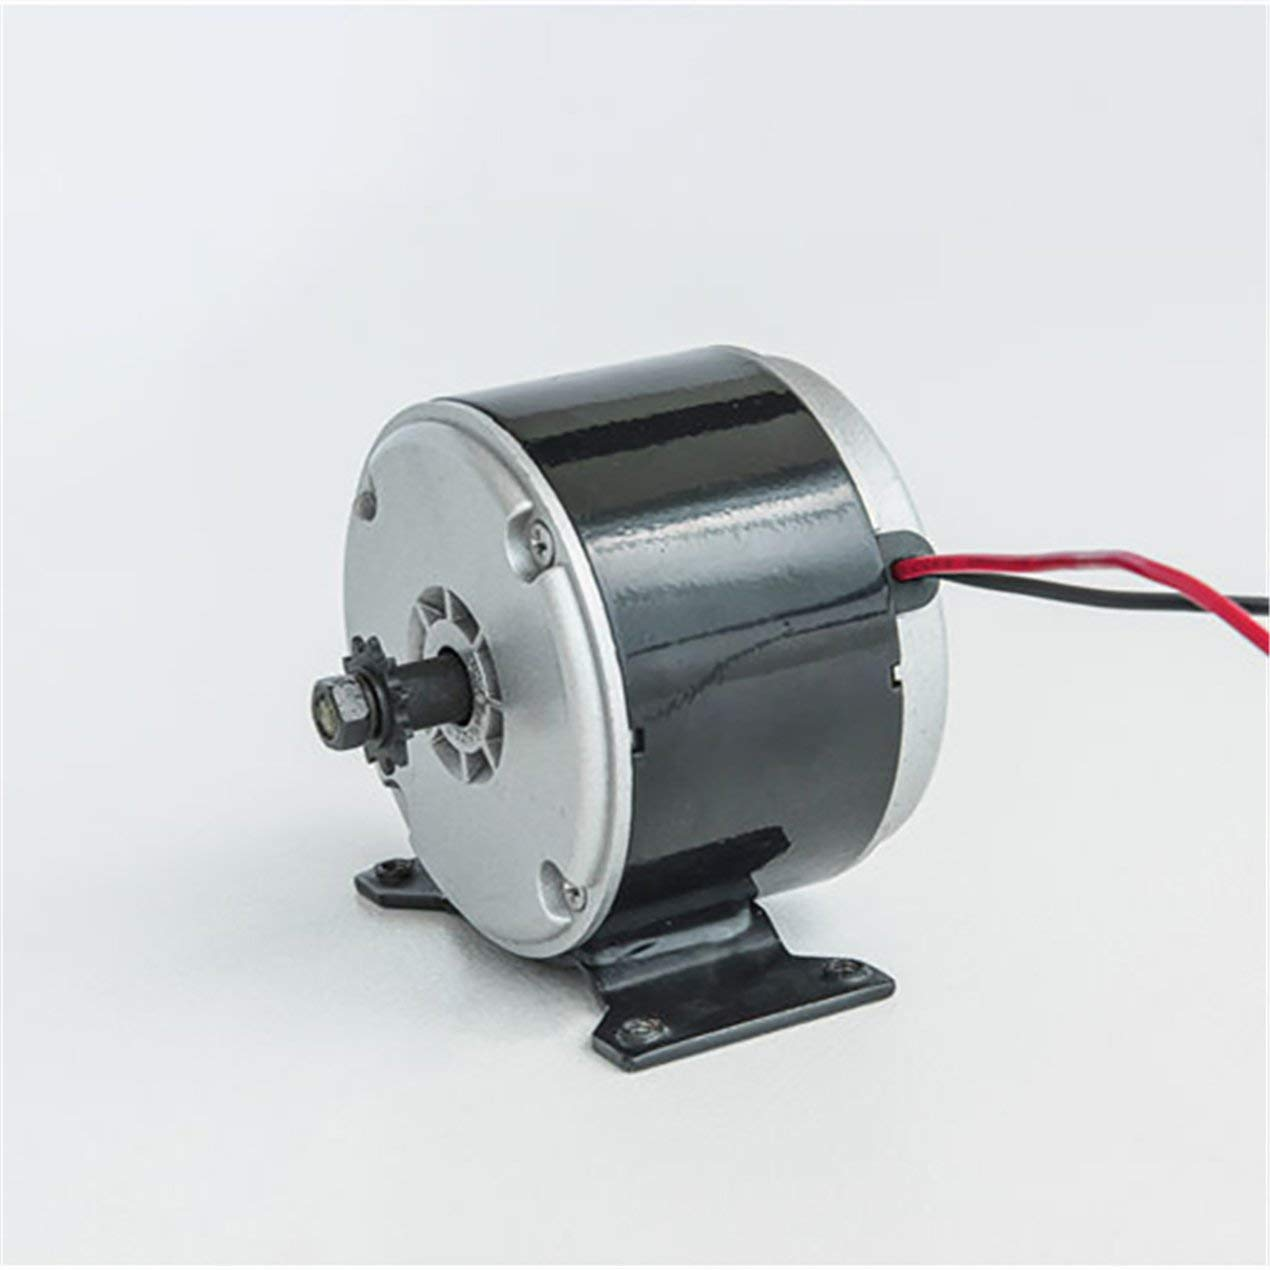 DC 24V Motor eléctrico Cepillado Profesional 250W 350W Imán Permanente Generador de Motor eléctrico para E Scooter